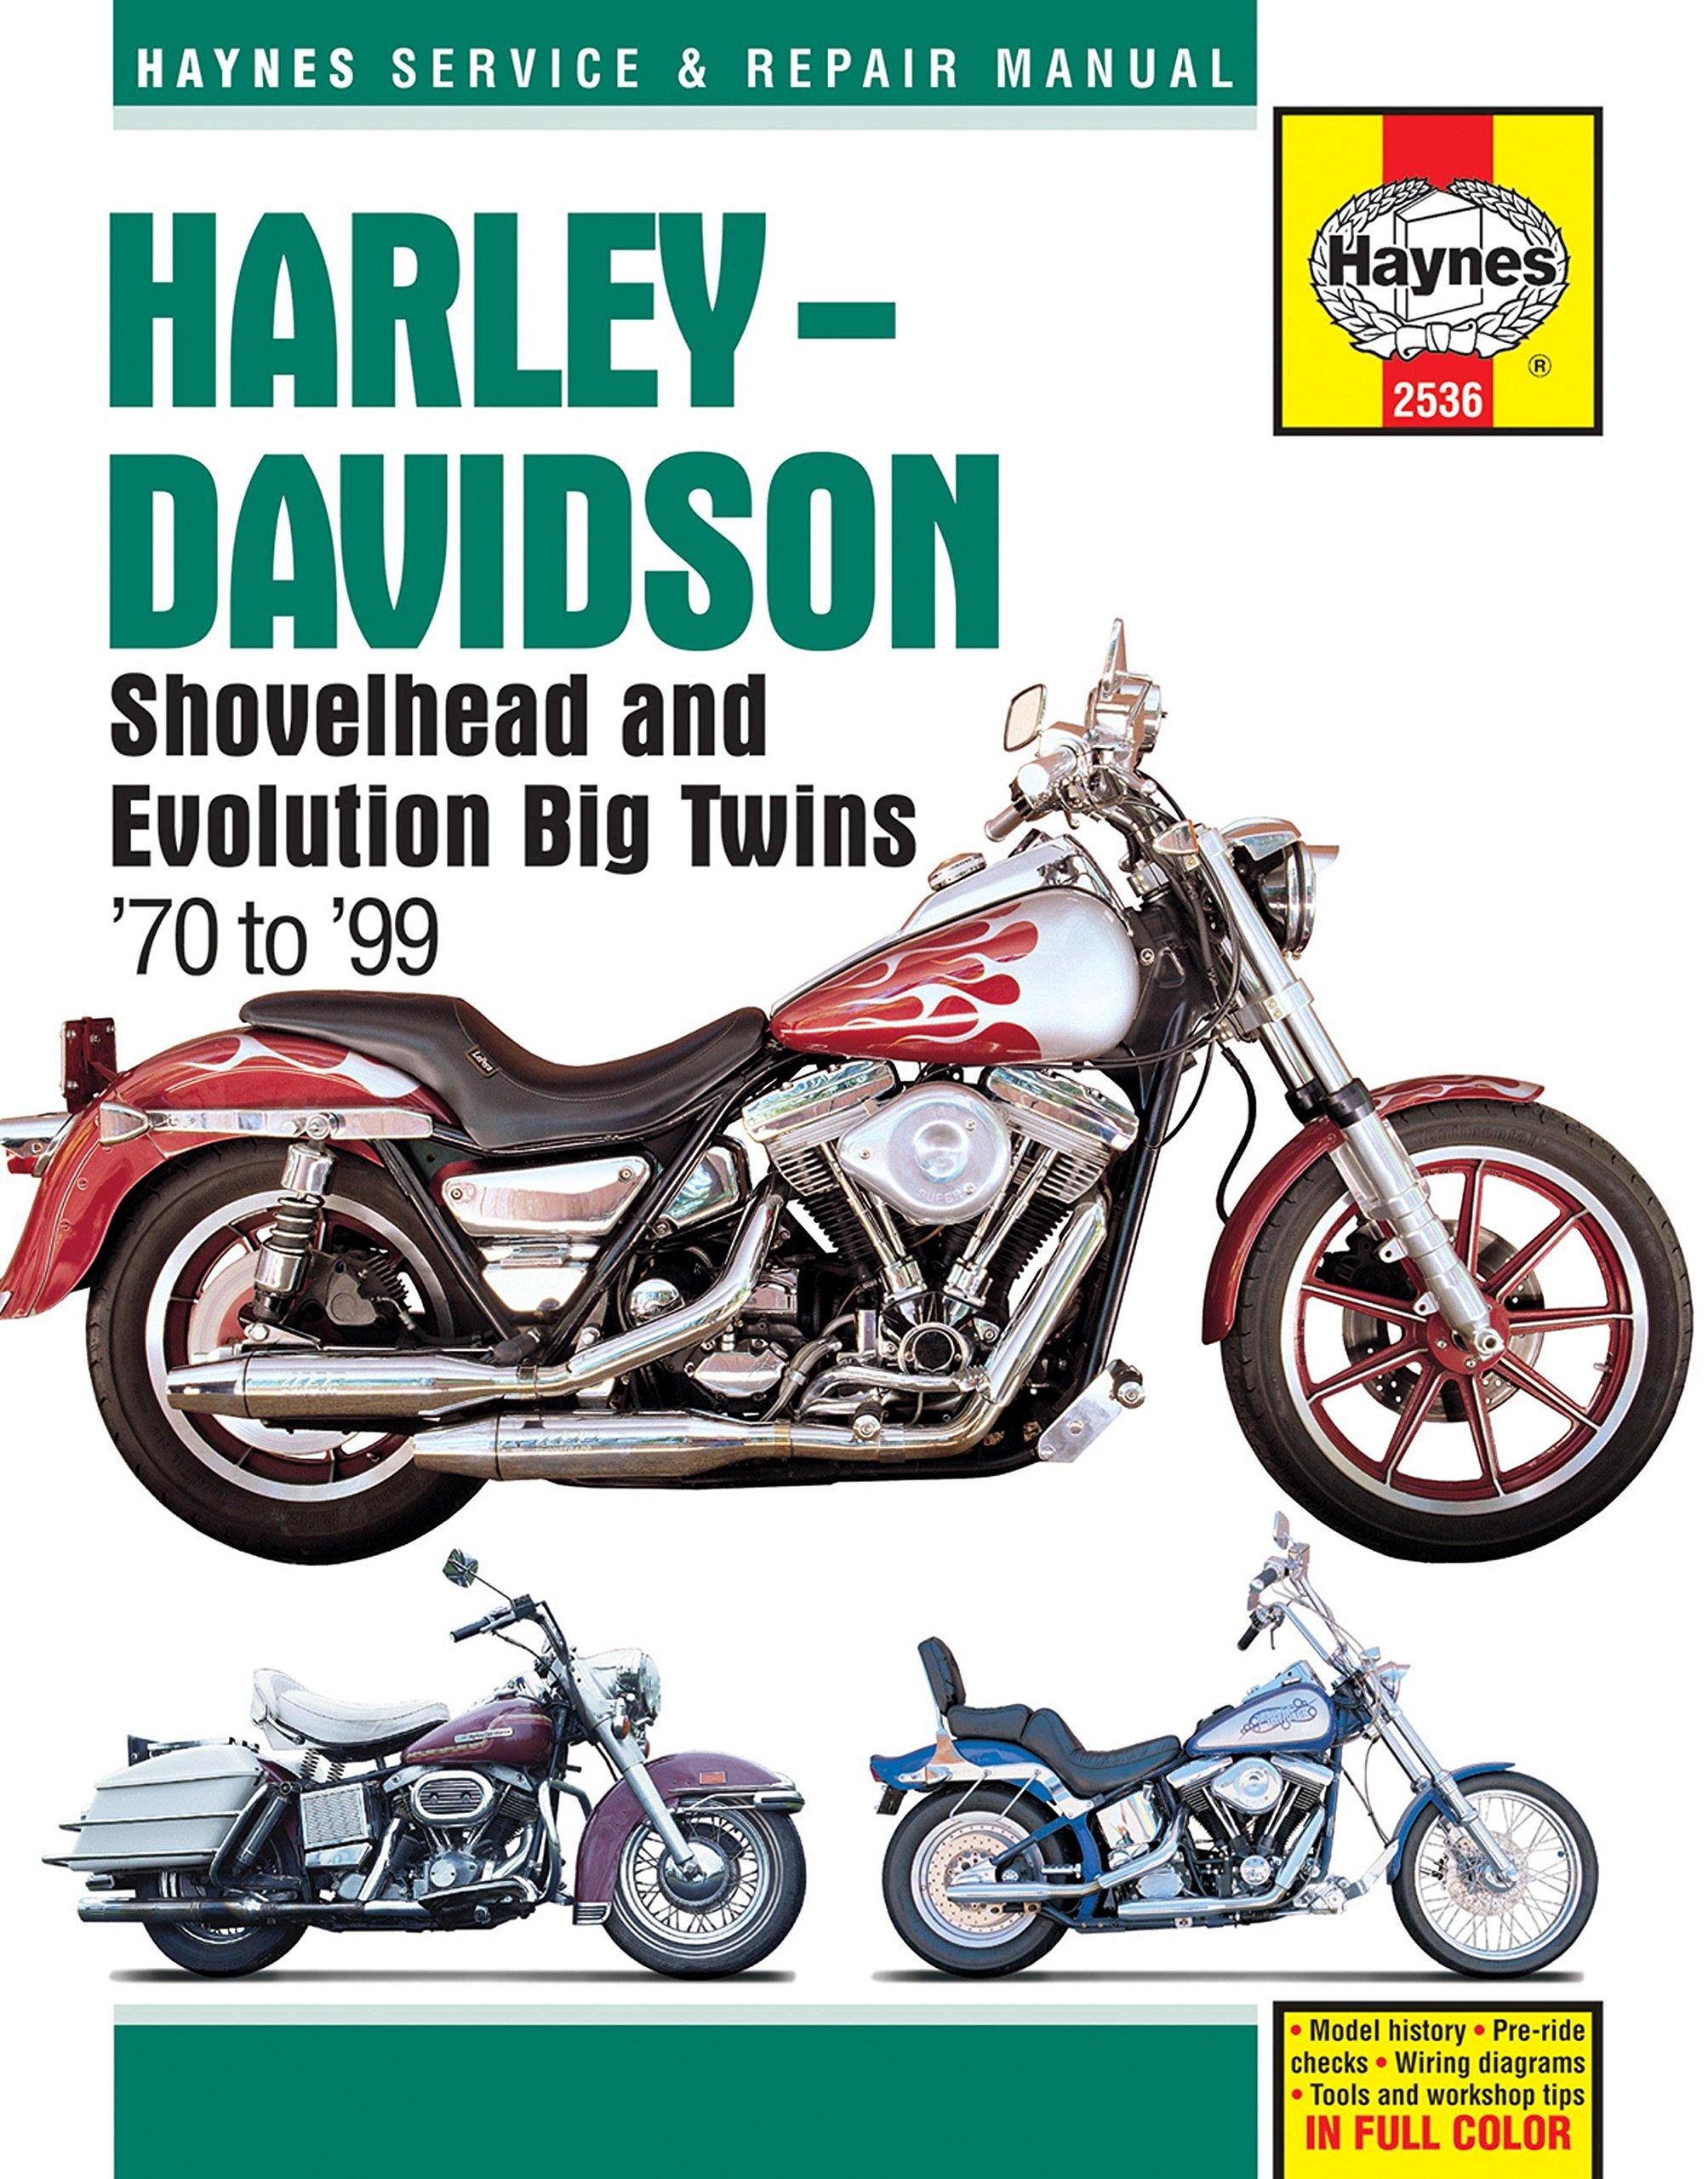 Cheap Harley Vespa Find Deals On Line At Alibabacom Vba Wiring Diagram Get Quotations Haynes 2536 Mc Shovelhead70 99